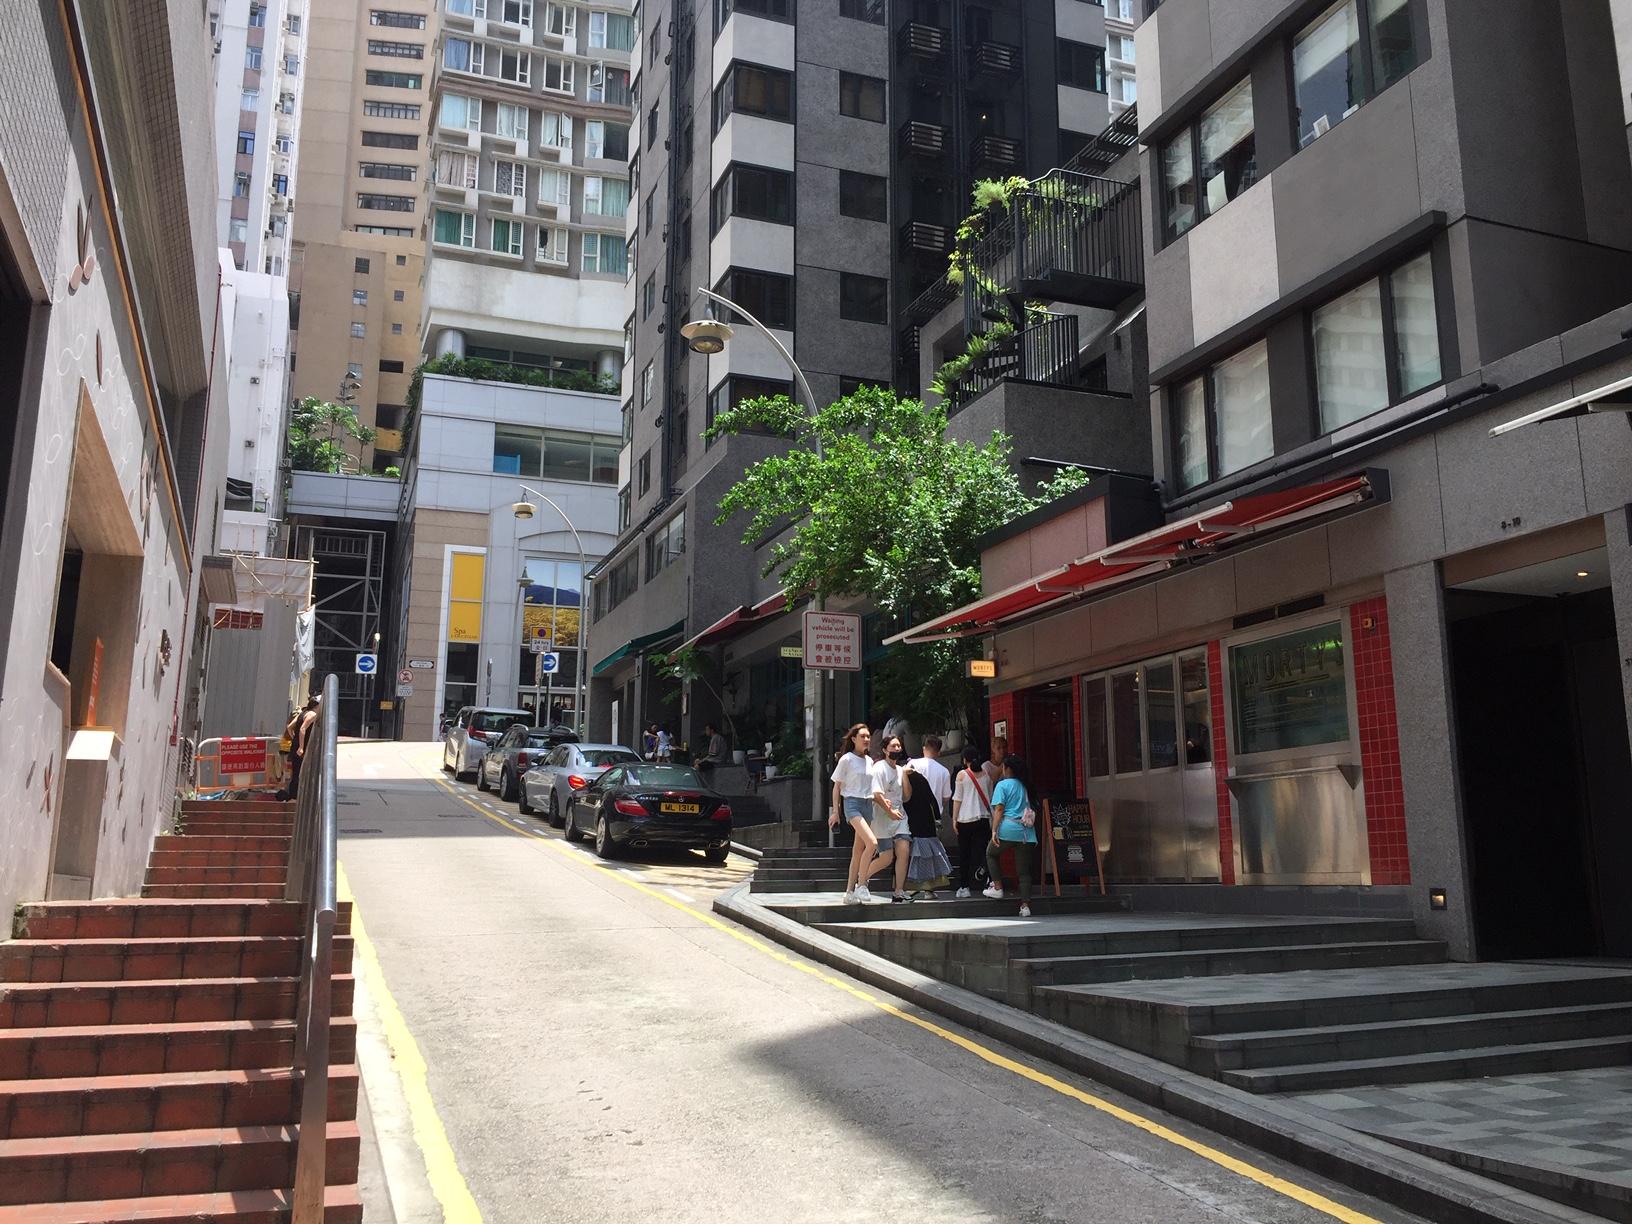 Hong Kong FB Shop for Rent Starstreet Precinct